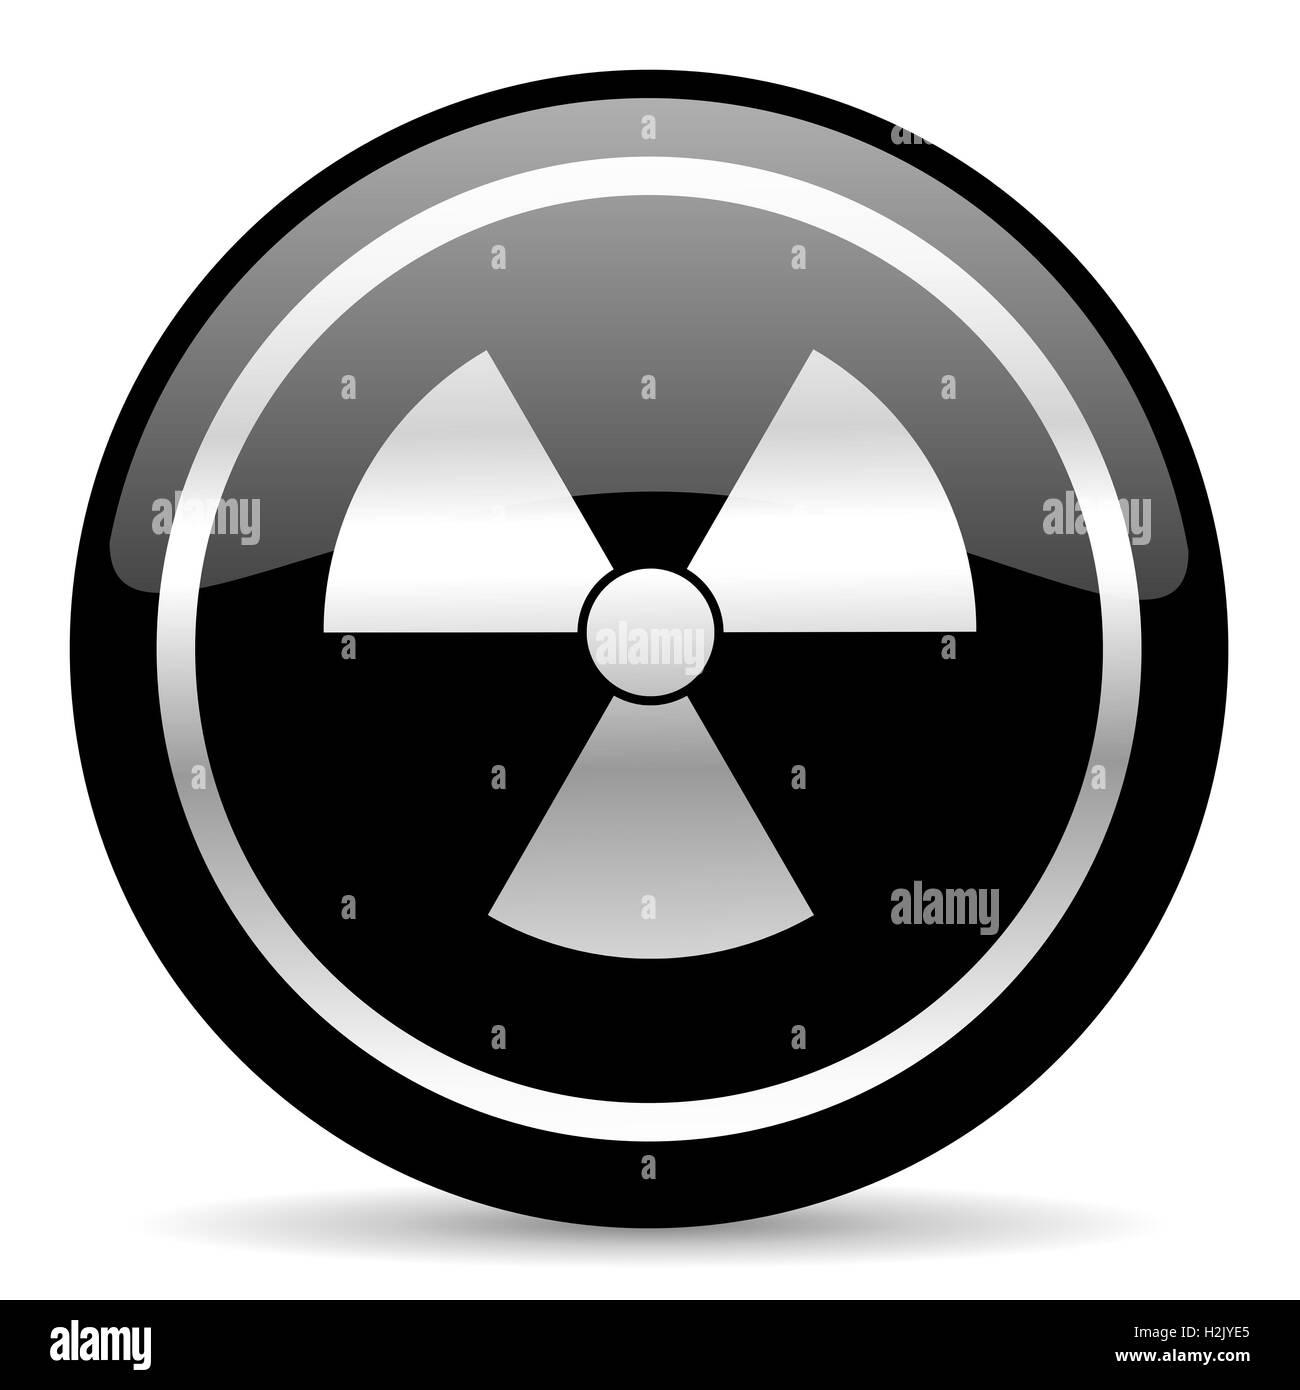 radiation icon - Stock Image